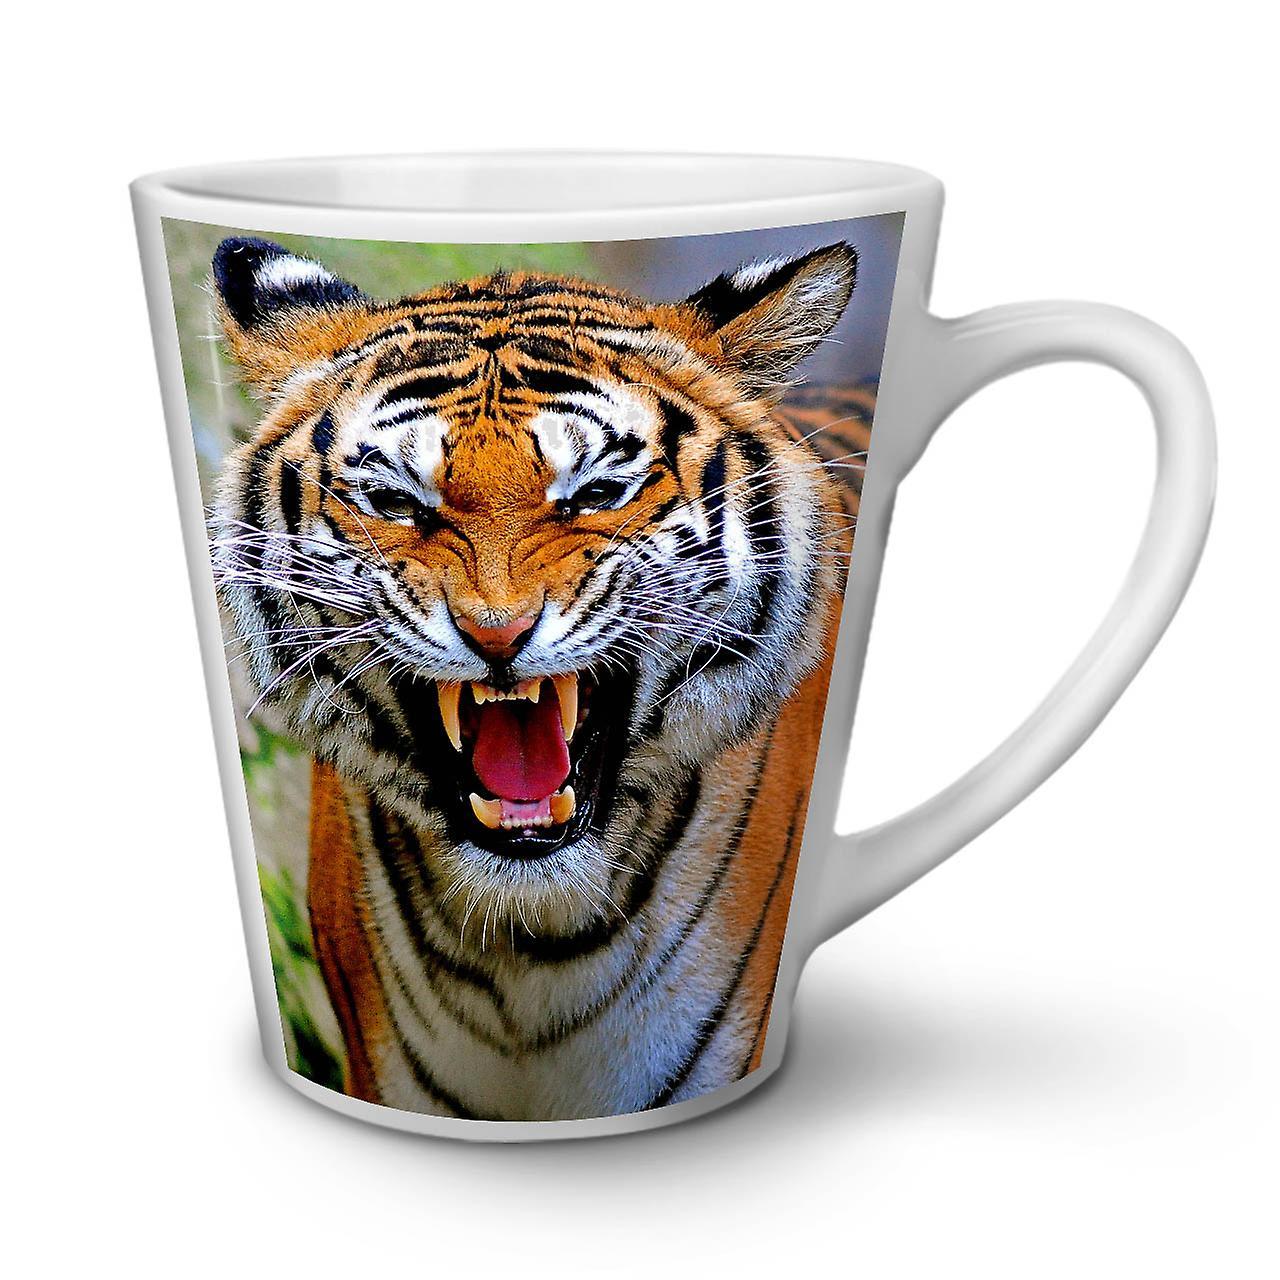 tiger foto katze tiere neue wei er tee kaffee keramik latte becher 12 oz wellcoda fruugo. Black Bedroom Furniture Sets. Home Design Ideas